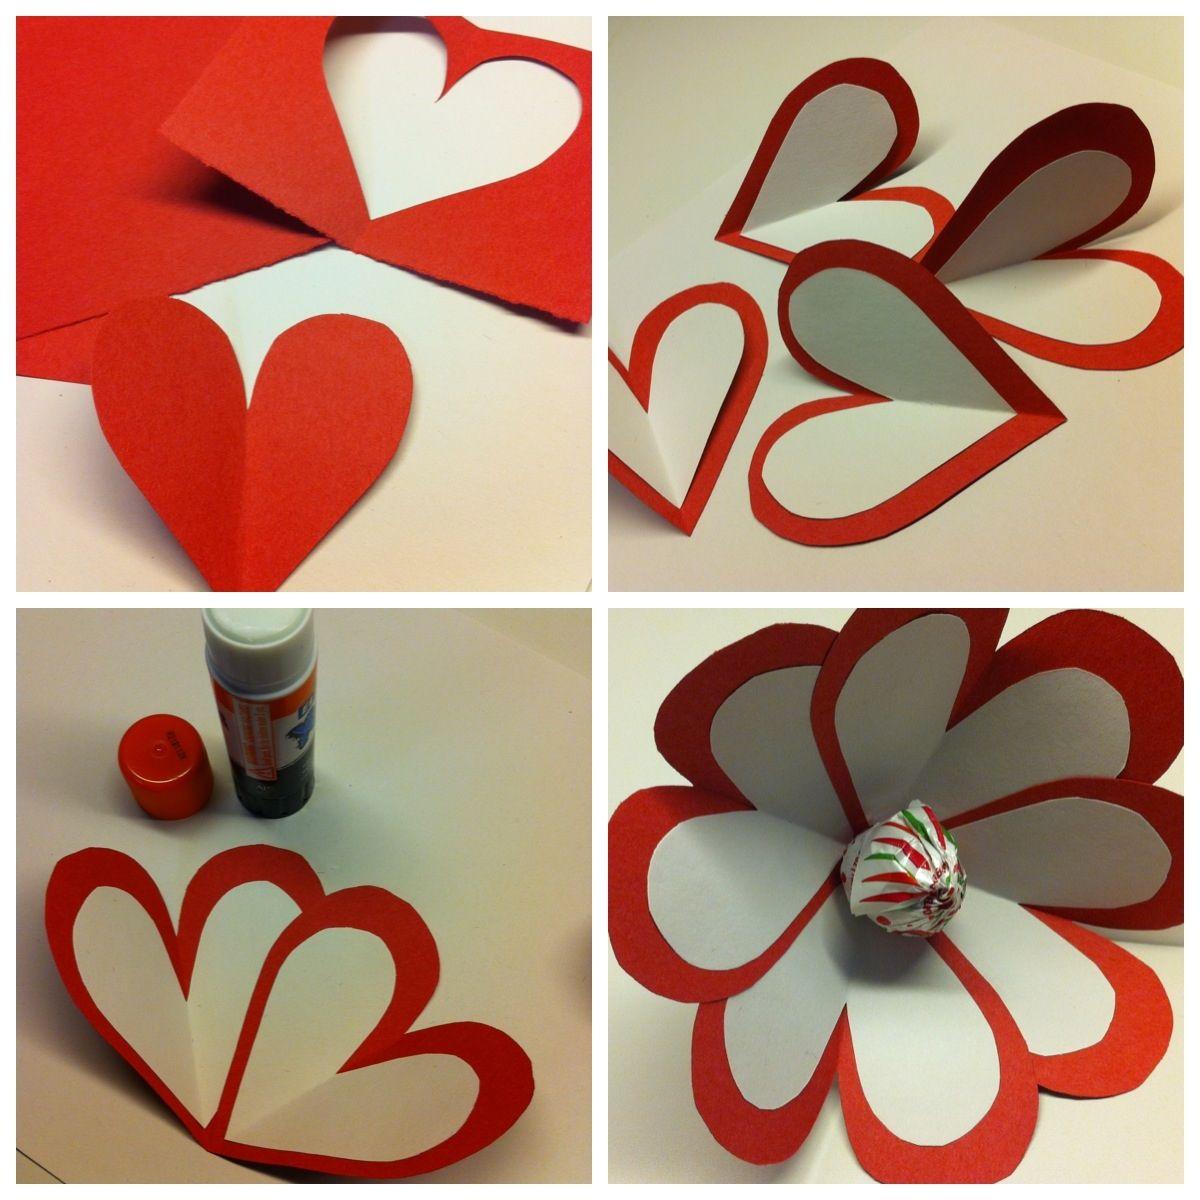 Kid Valentine Craft Ideas Part - 45: Valentine Craft Party Ideas. Valentines Day Kids Crafts Ideas For Kids I  Love YouPicture And